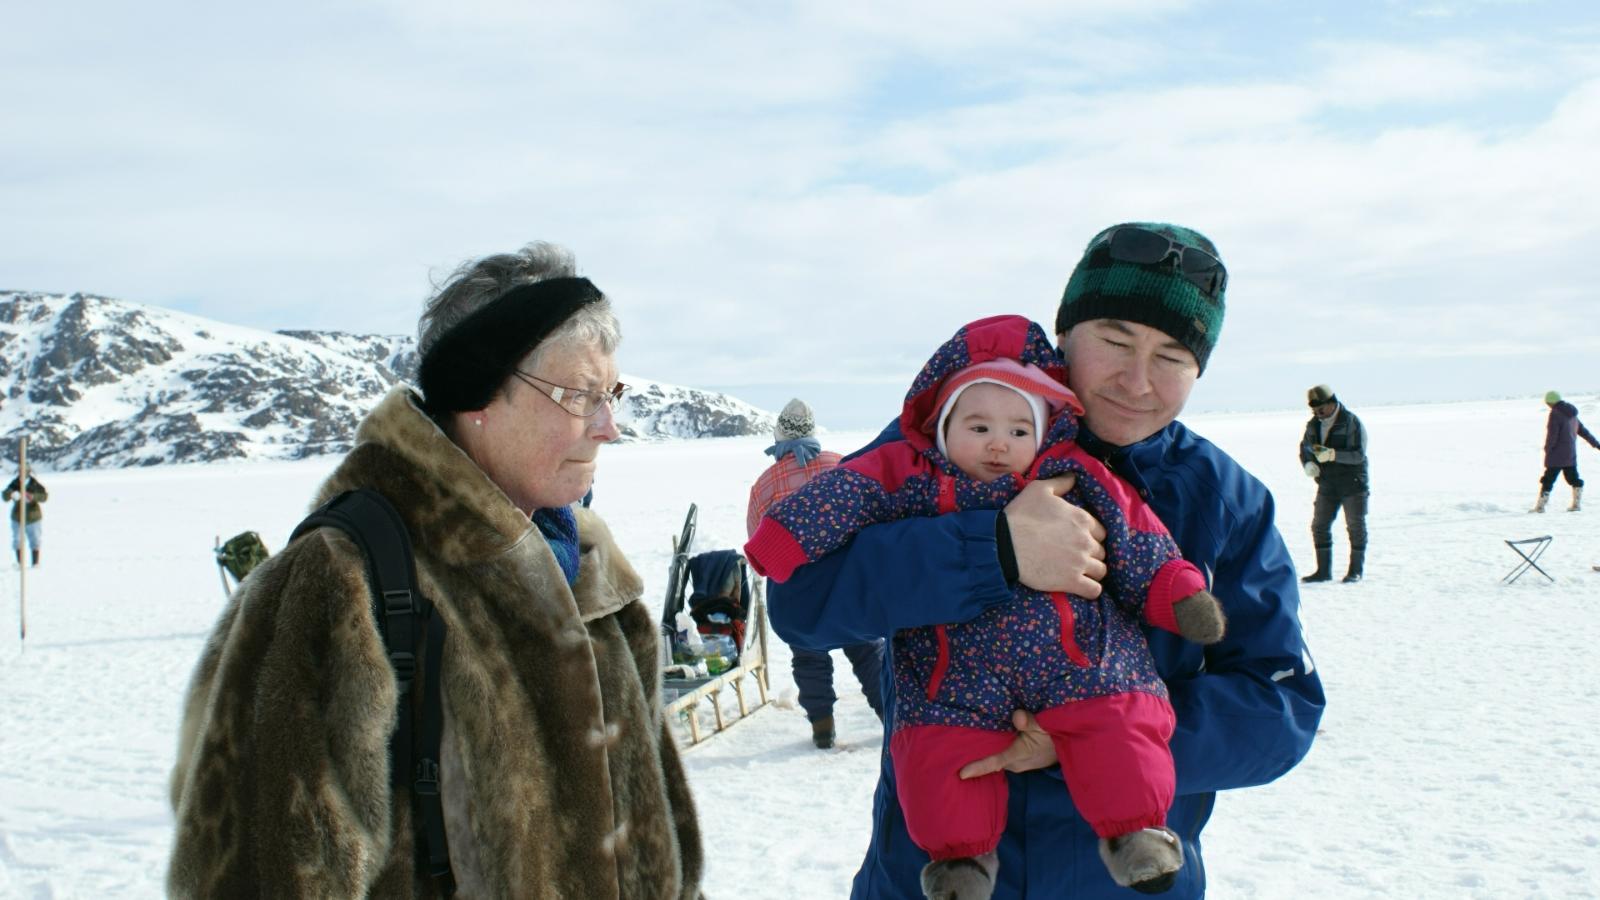 2009-04-05-1525_-_Jesper Eugenius Labansen; Qupanuk Eugenius Labansen; Ruth Labansen